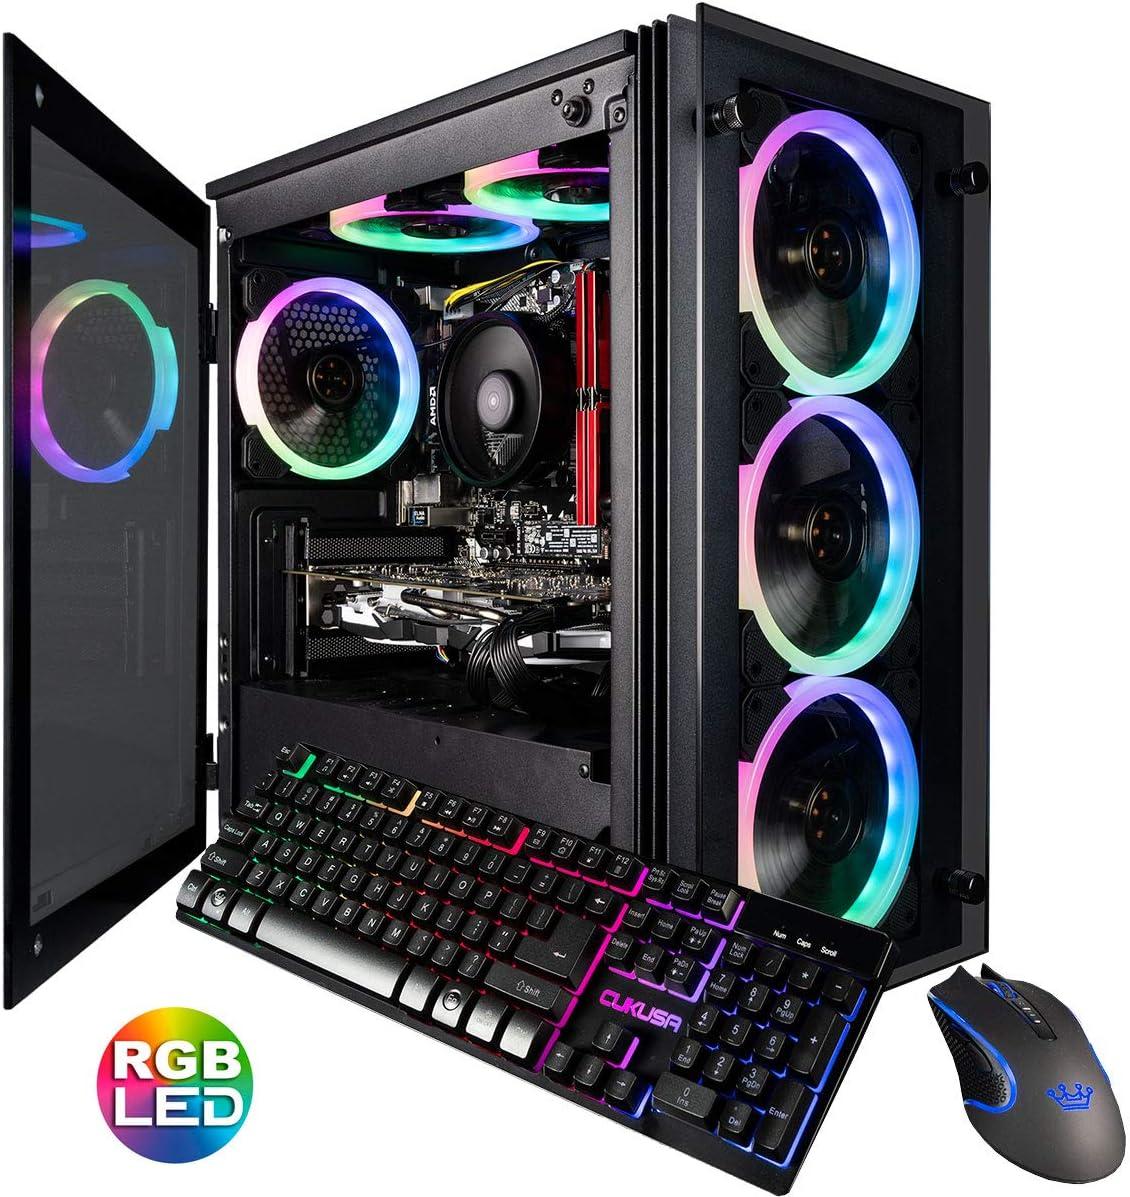 CUK Stratos Micro Gaming Desktop (AMD Ryzen 7 3700X, 32GB DDR4 3600 RAM, 1TB NVMe SSD, Radeon RX 5700 XT 8GB, 600W Gold PSU, AC WiFi, Windows 10 Home) Video Editing Gamer PC Computer